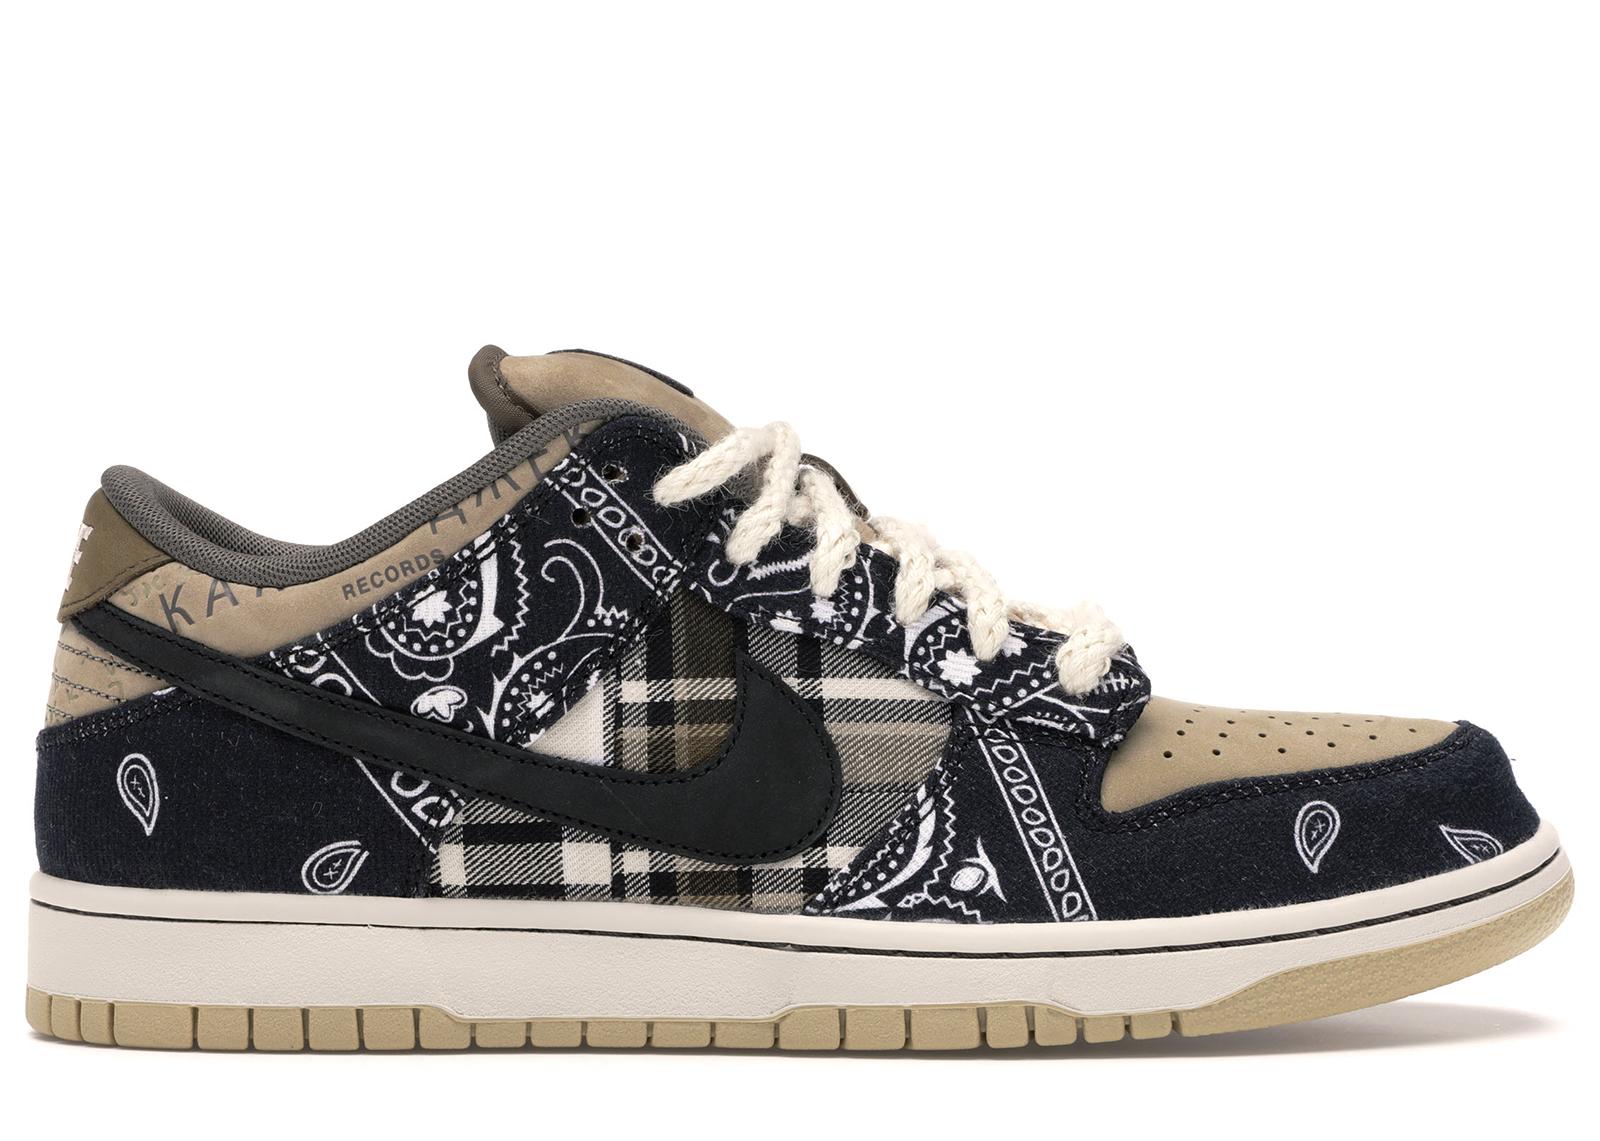 Buy Nike SB Shoes & Deadstock Sneakers